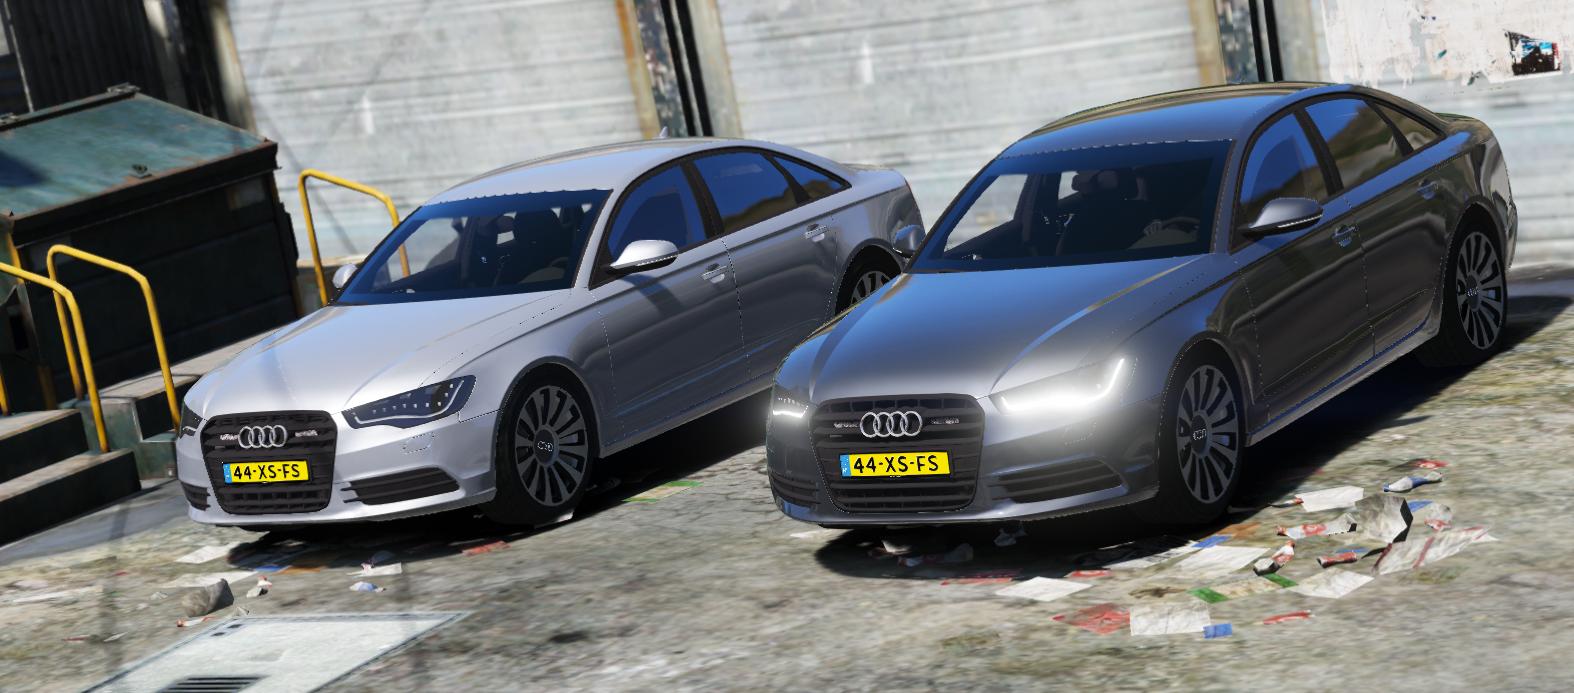 Audi A6 c7 Politie Arrestatieteam V2 - GTA5-Mods com